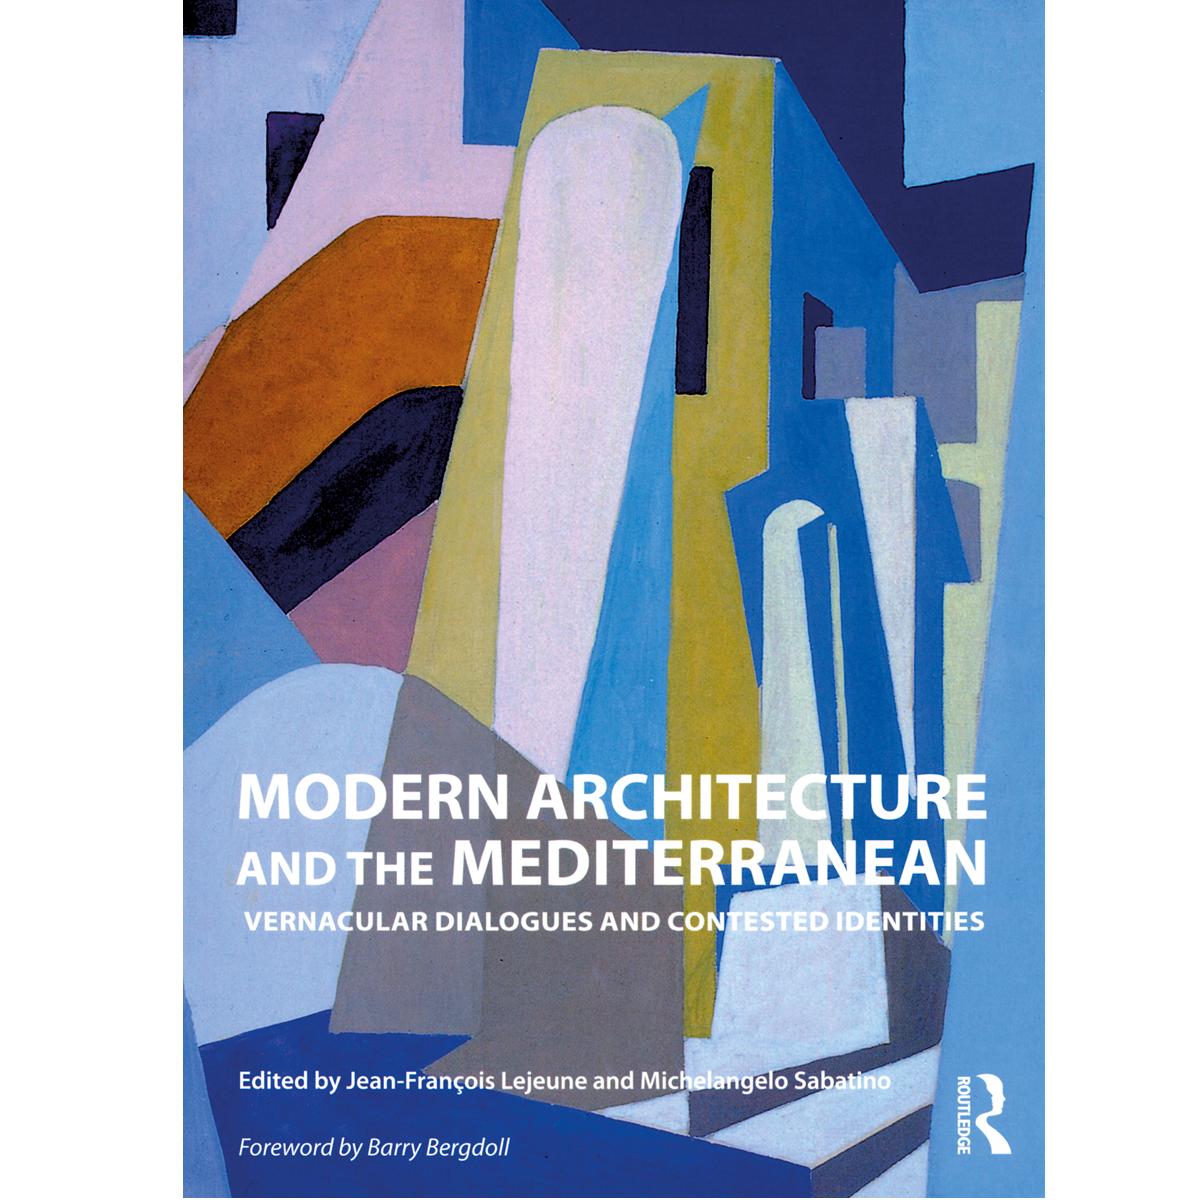 Modern Architecture and the Mediterranean